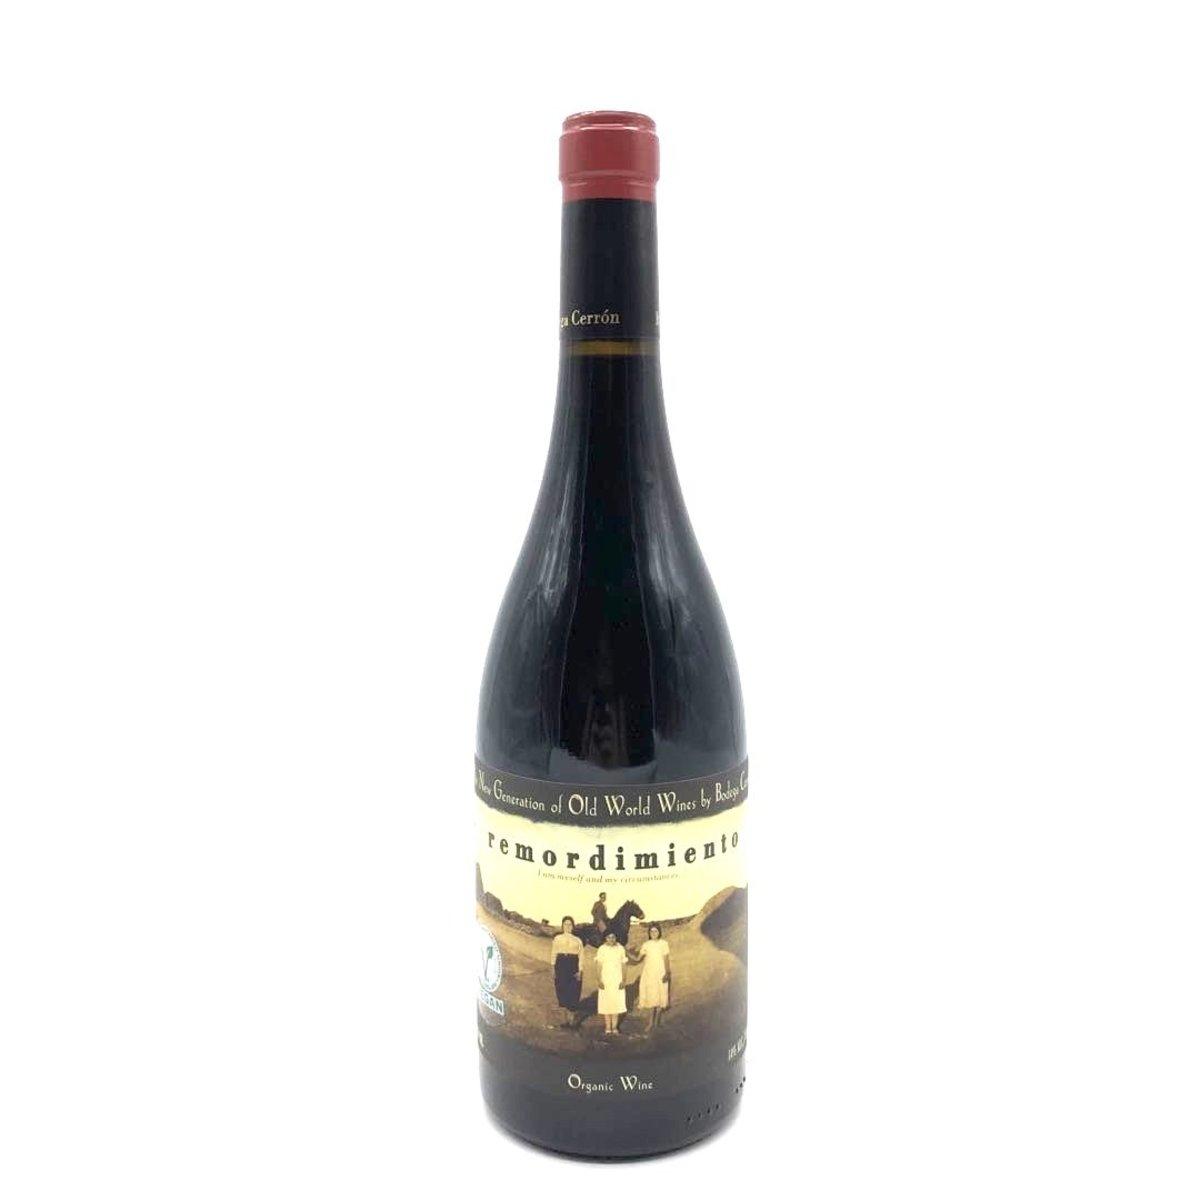 Bodega Cerron Remordimiento Organic Spain Red Wine 2013